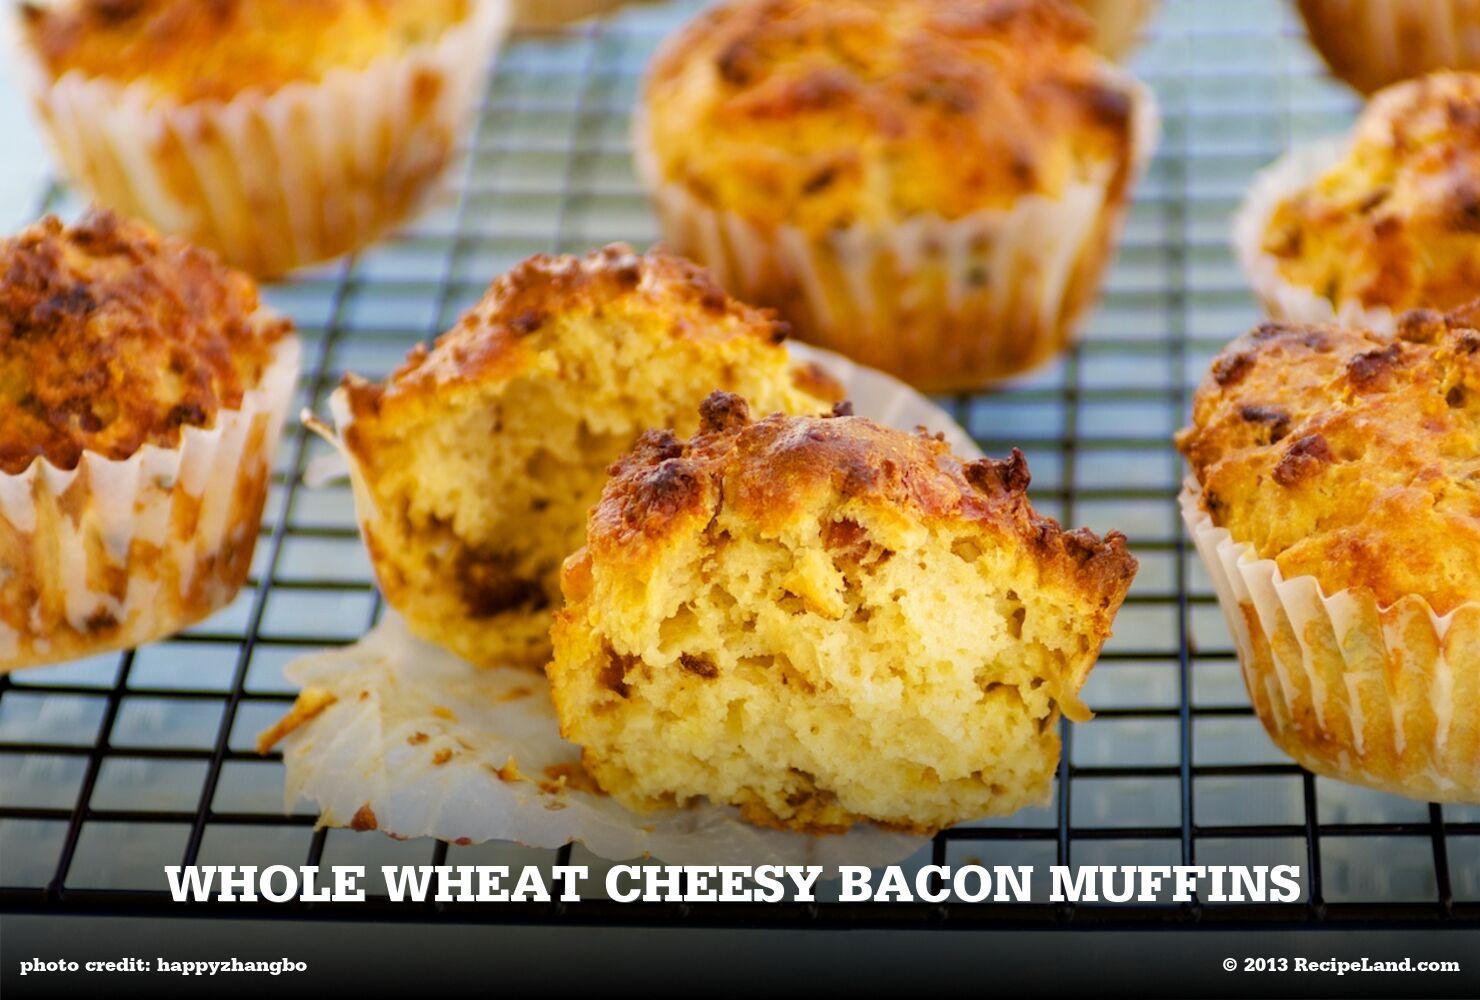 Whole Wheat Cheesy Bacon Muffins